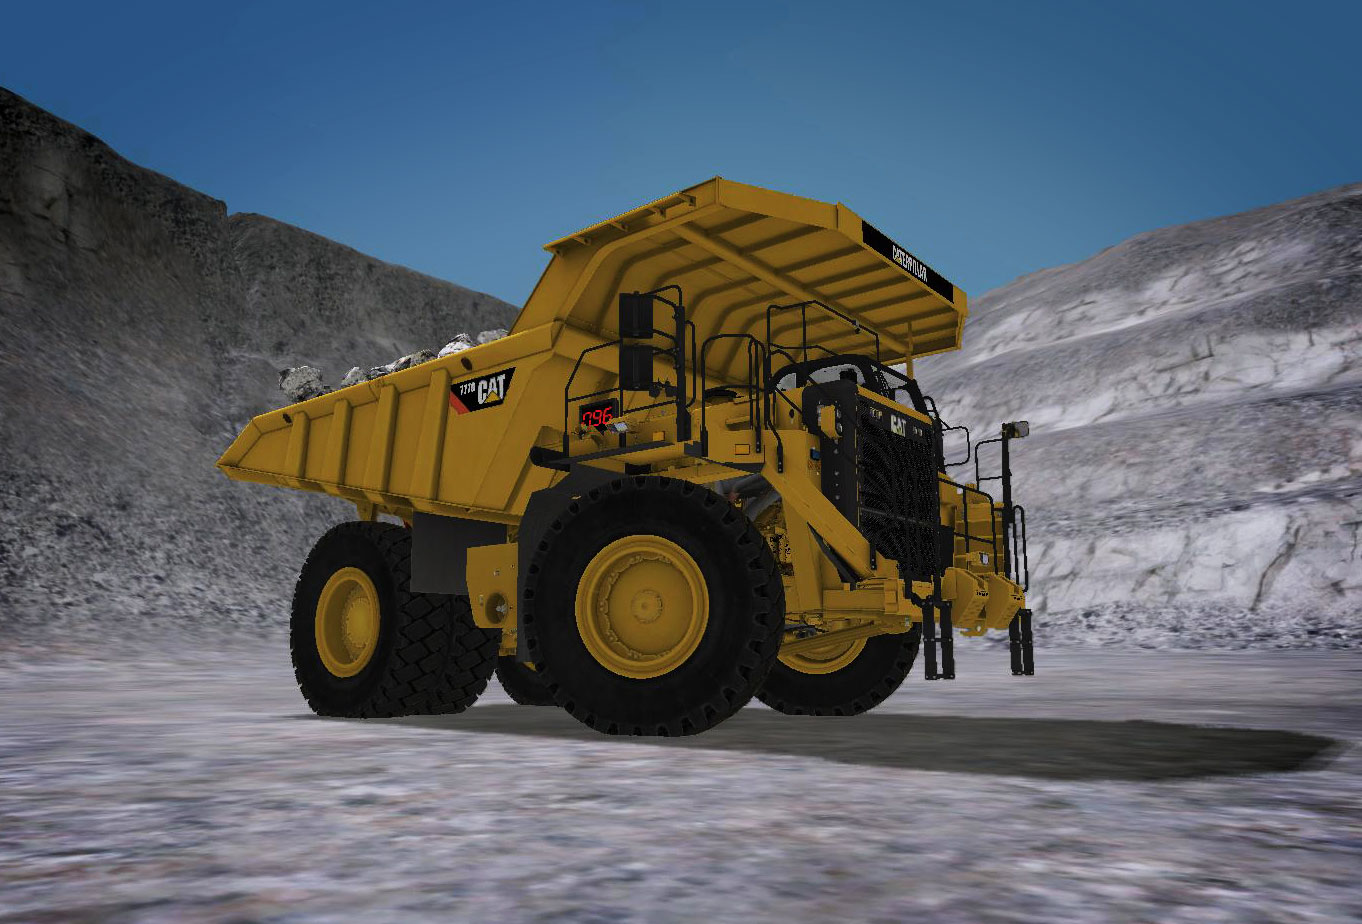 CSE Software Inc. Develops Off-Highway Truck Simulation